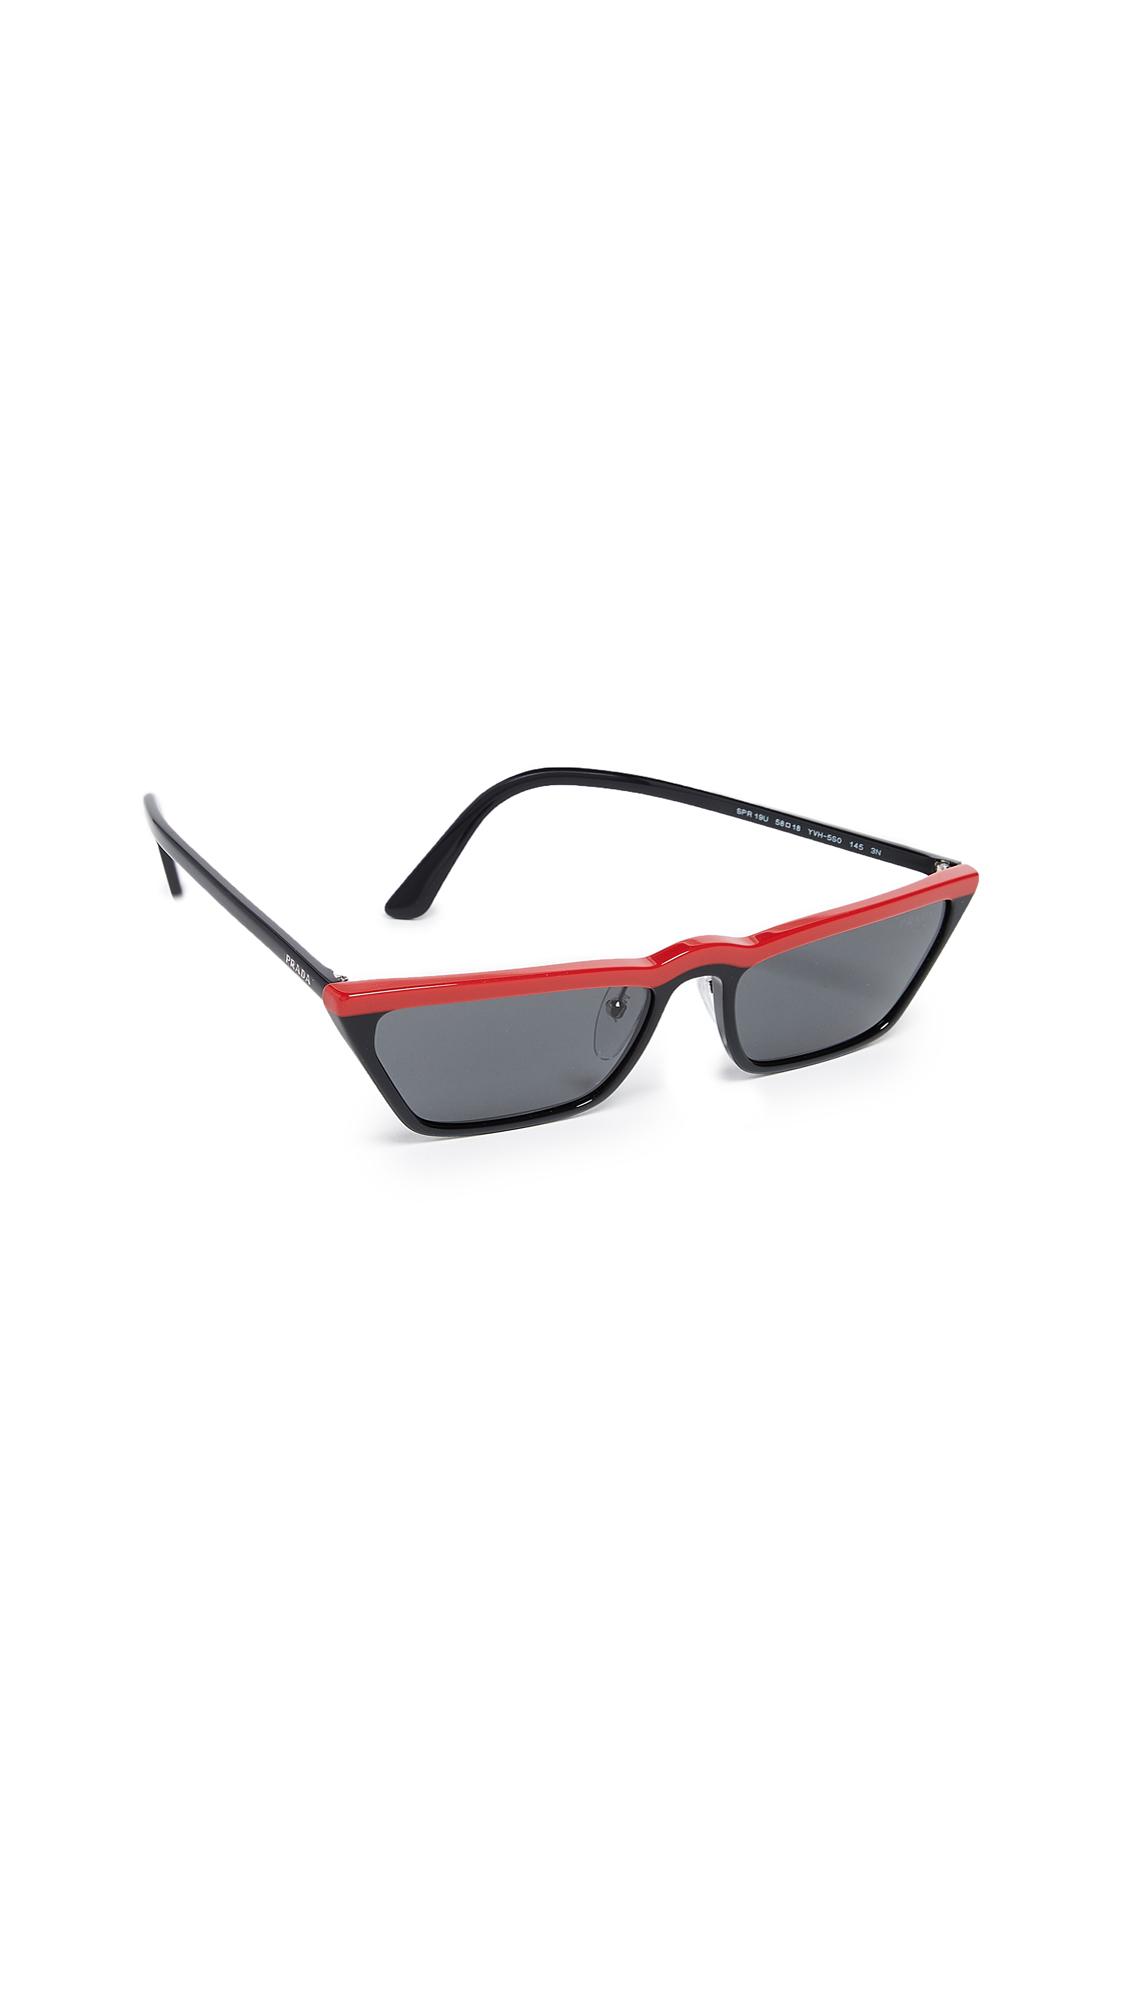 Prada Ultravox Sunglasses In Red Black/Grey